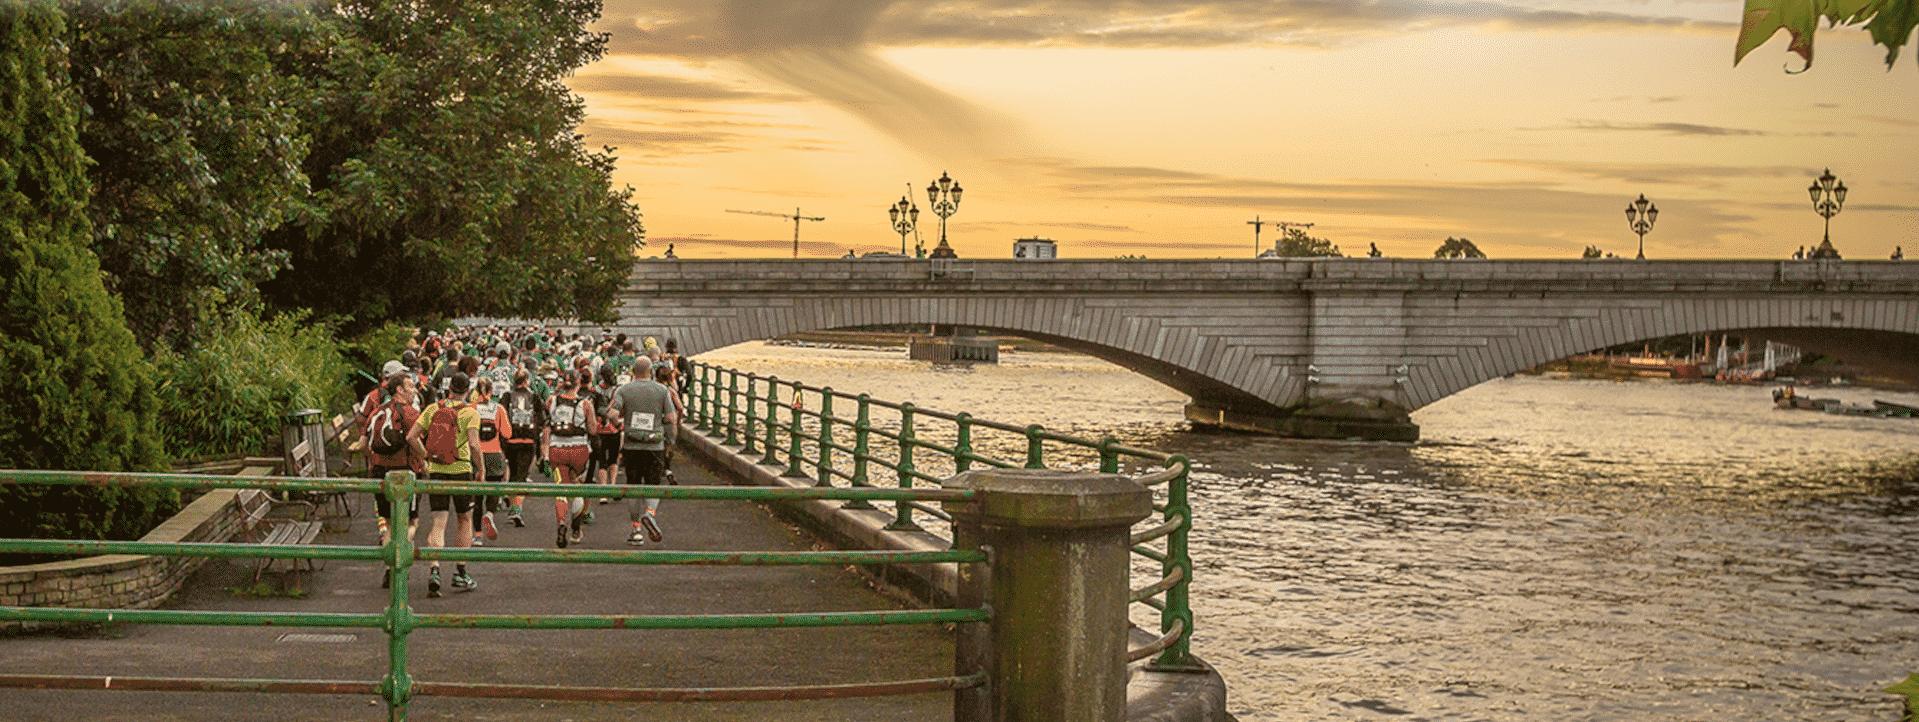 Thames Path - Henley Bridge